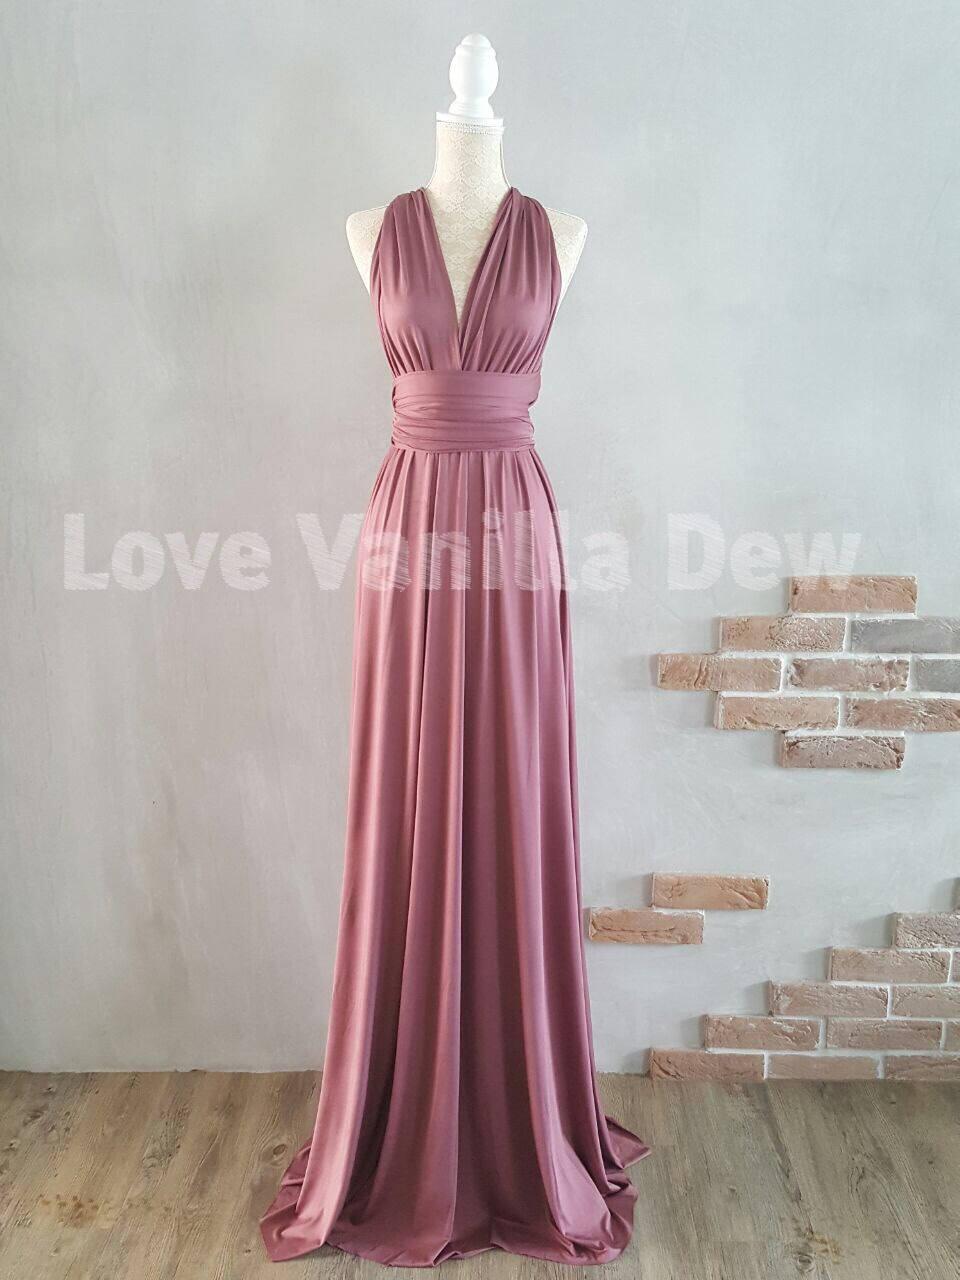 Brautjungfer Kleid Infinity Kleid Pflaume Bodenlanges Maxi